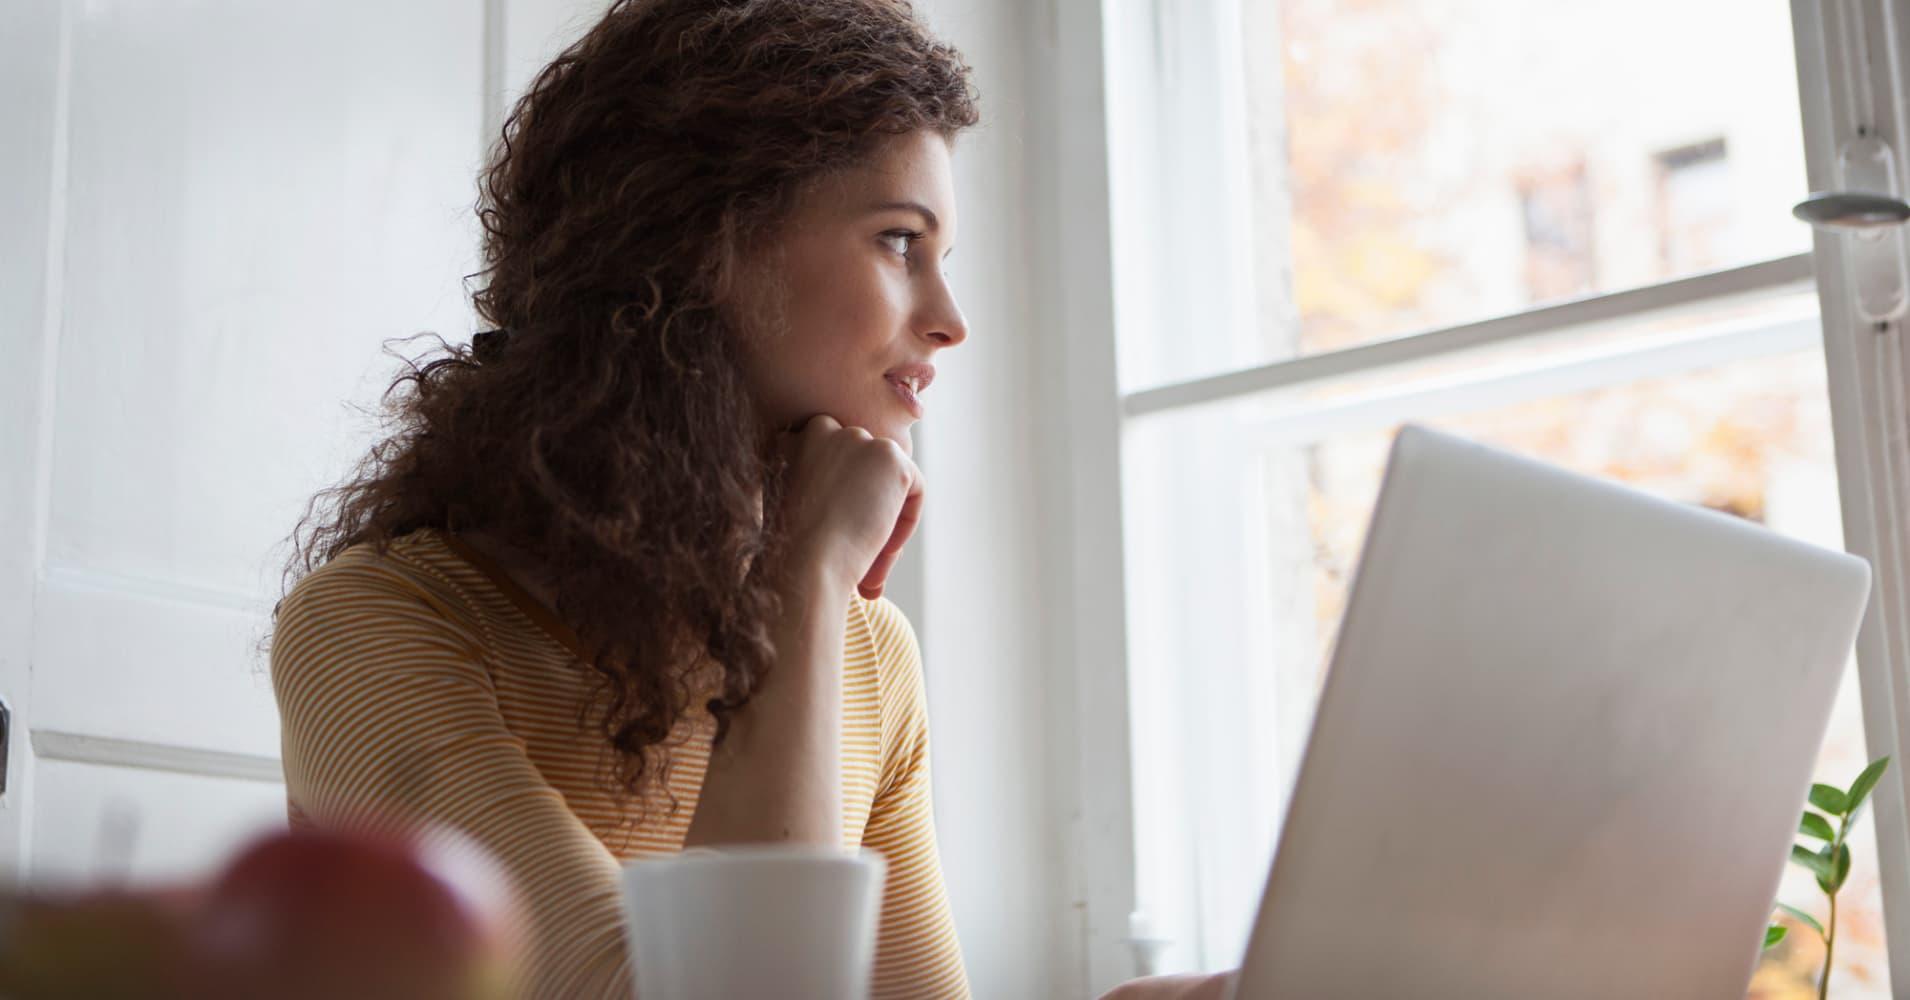 Millennial freelance